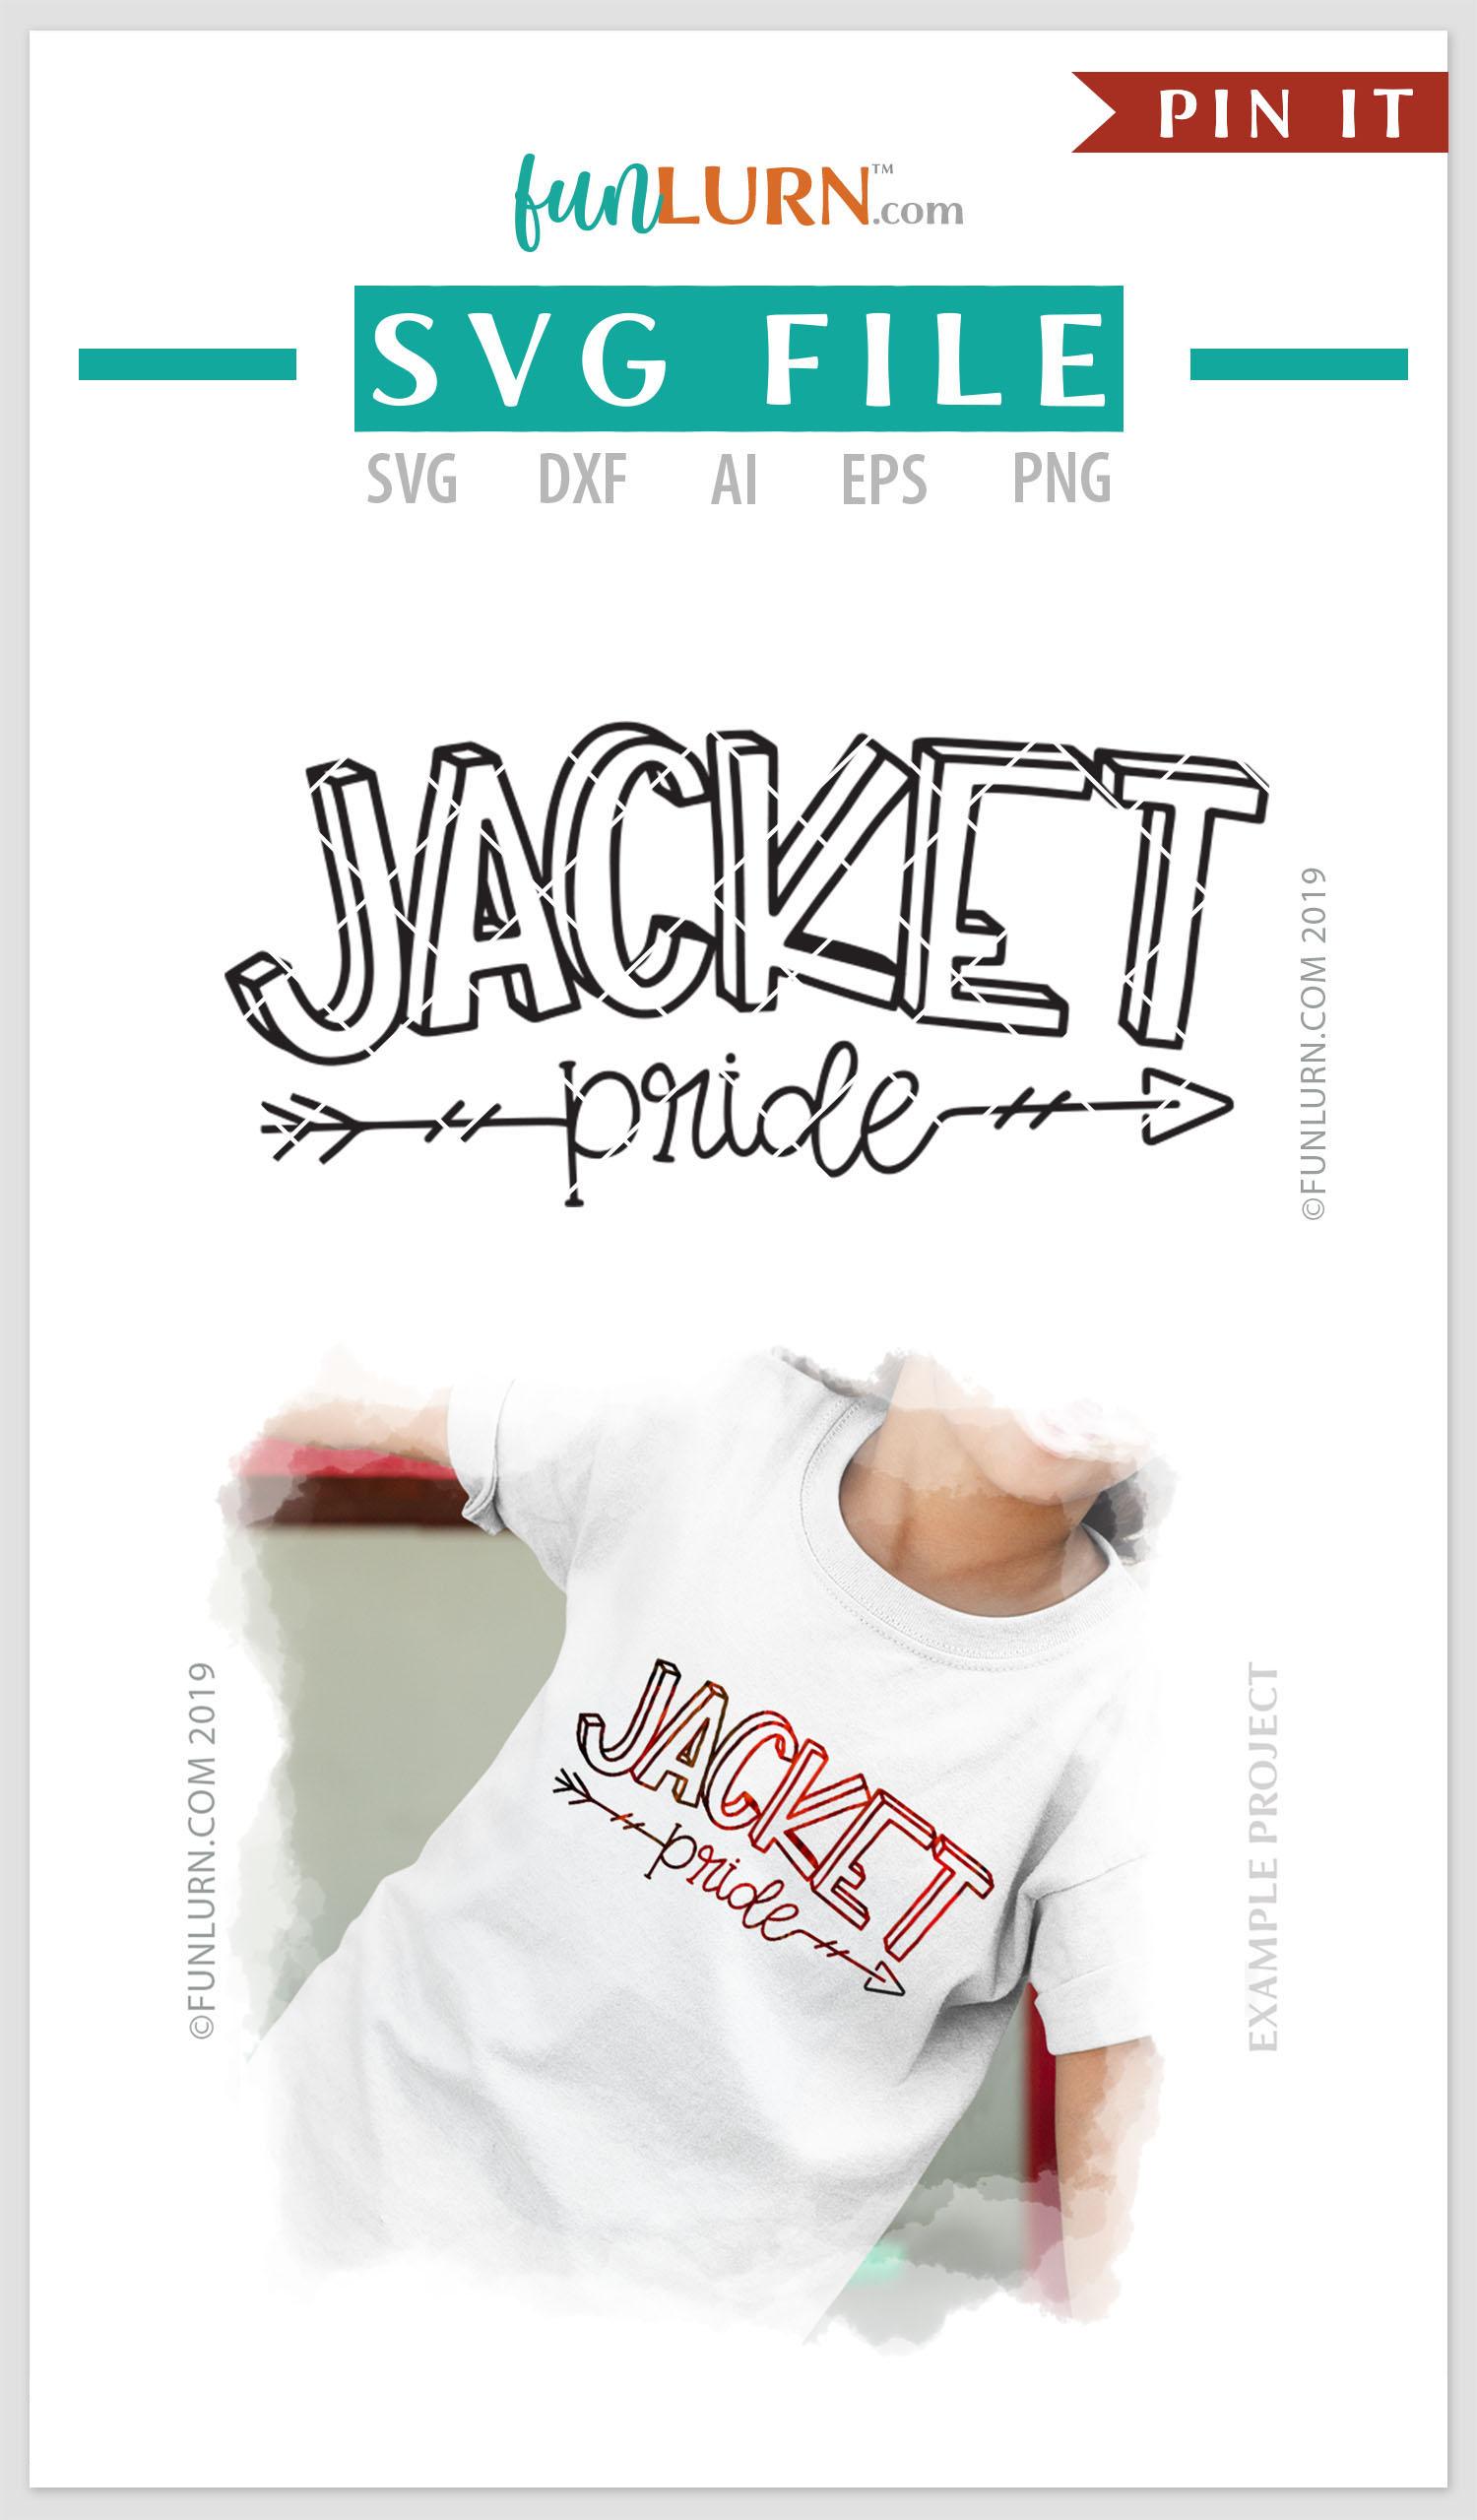 Jacket Pride Team SVG Cut File example image 4